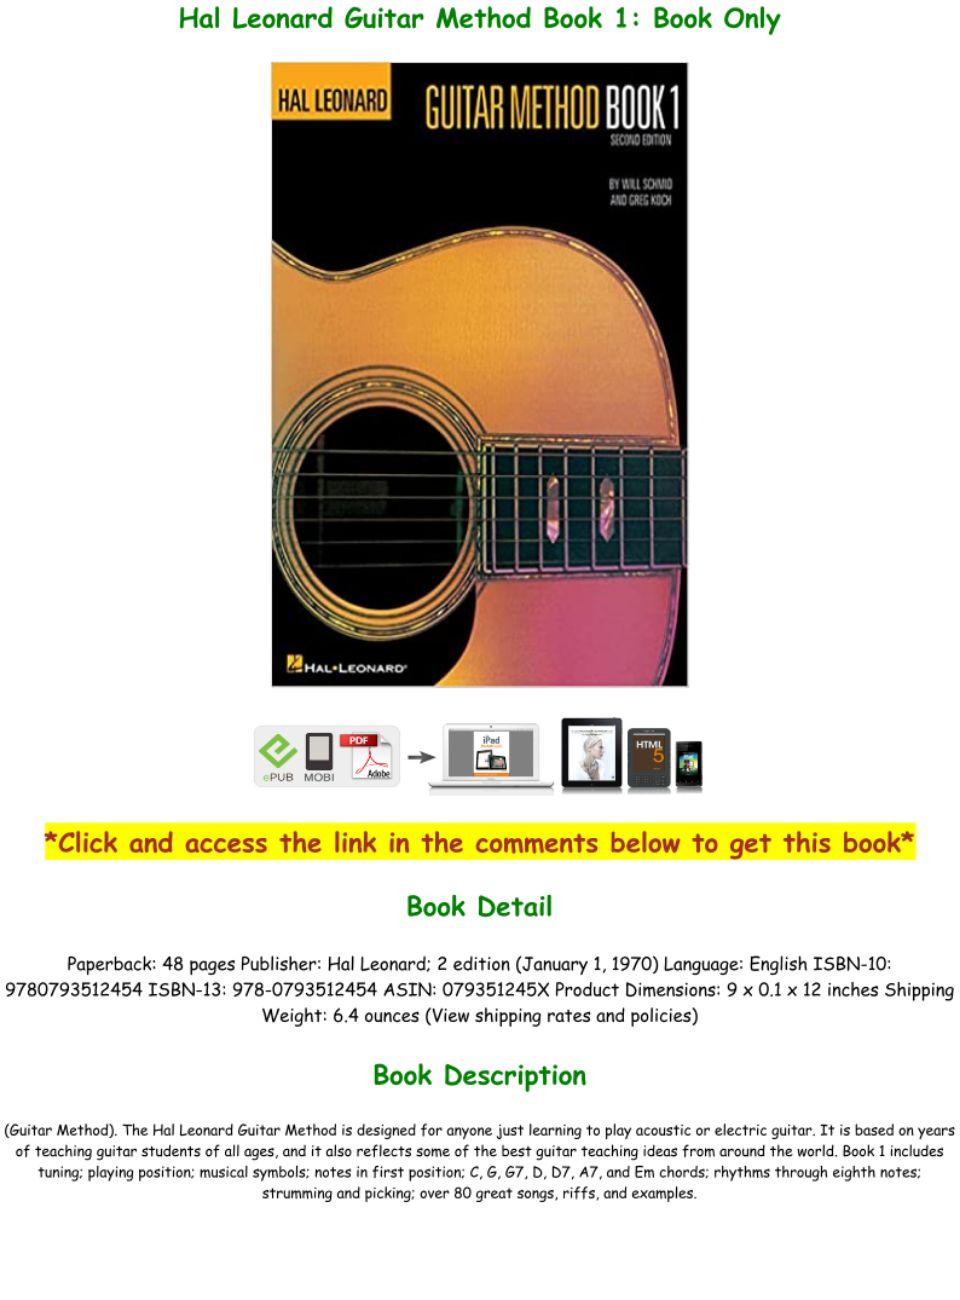 Hal Leonard Guitar Method Book 1 Pdf